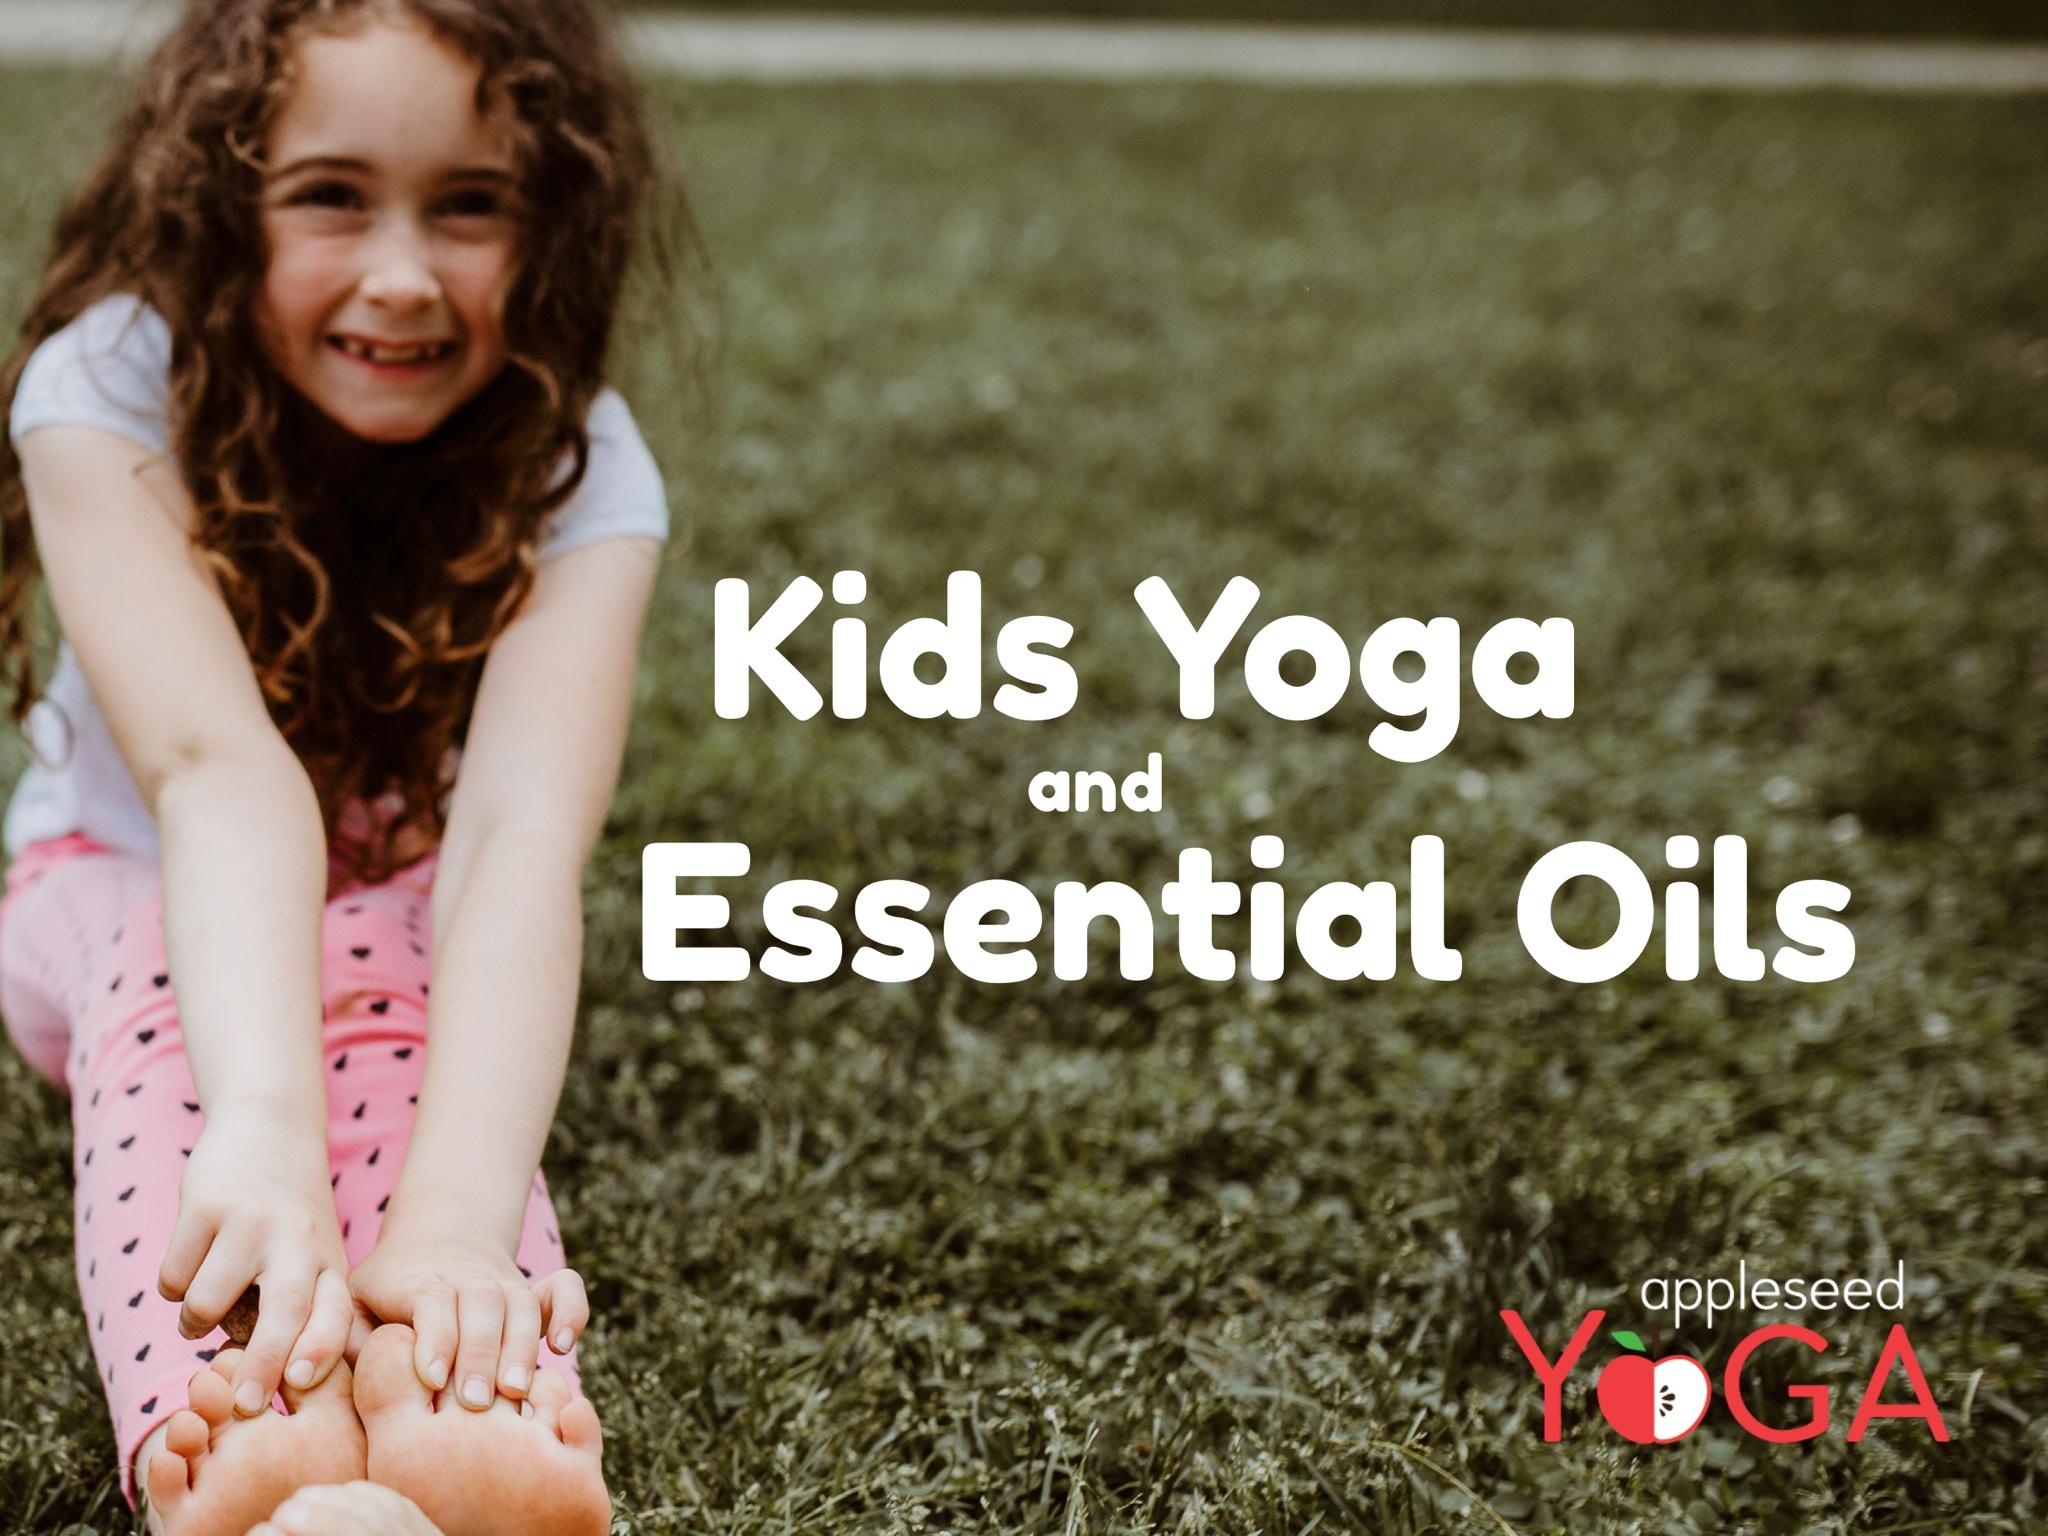 Kids+Yoga+%2B+EO+logo.001.jpg